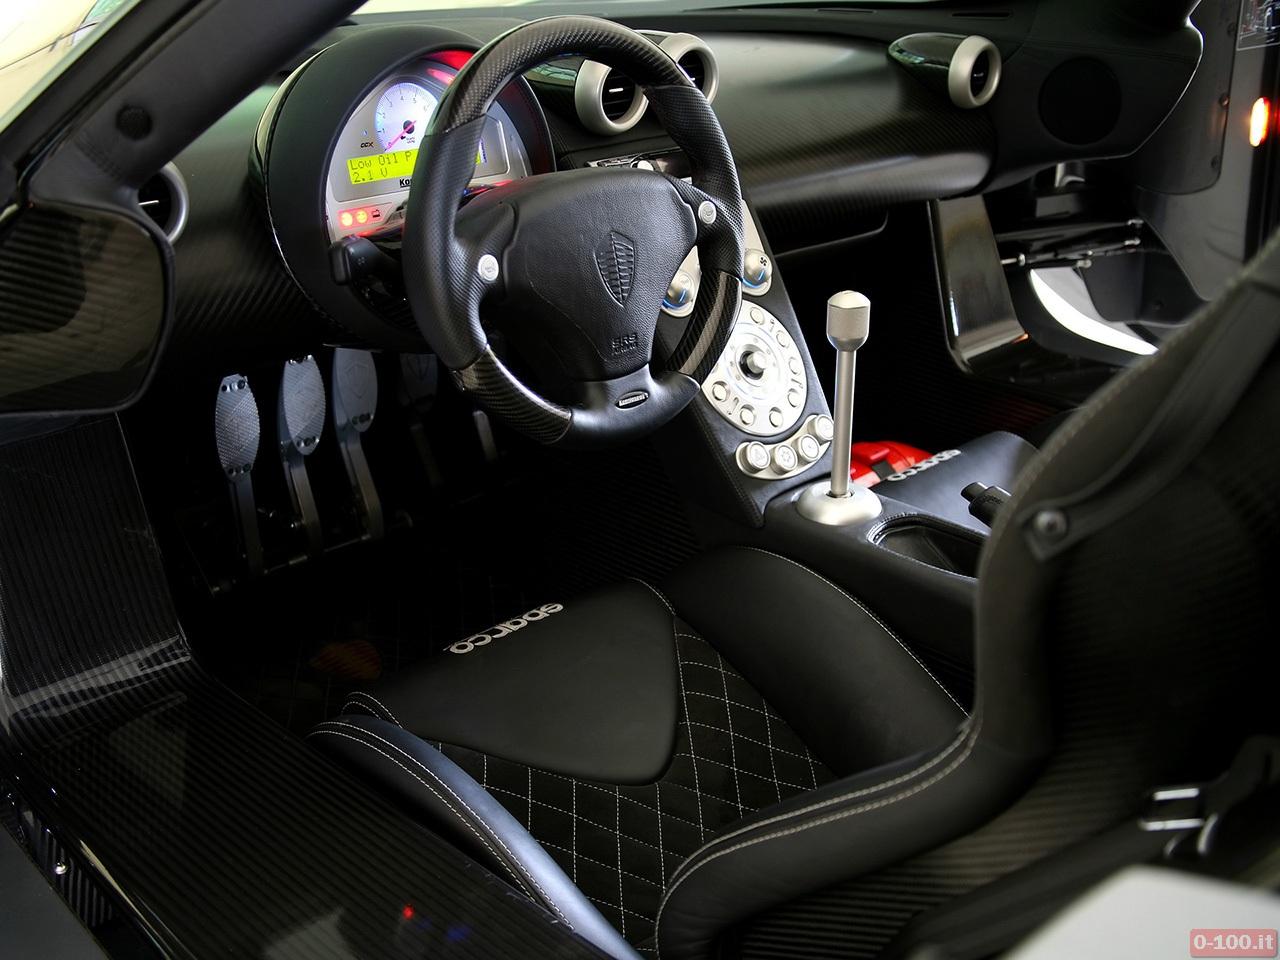 Koenigsegg CCX - 0-100.it